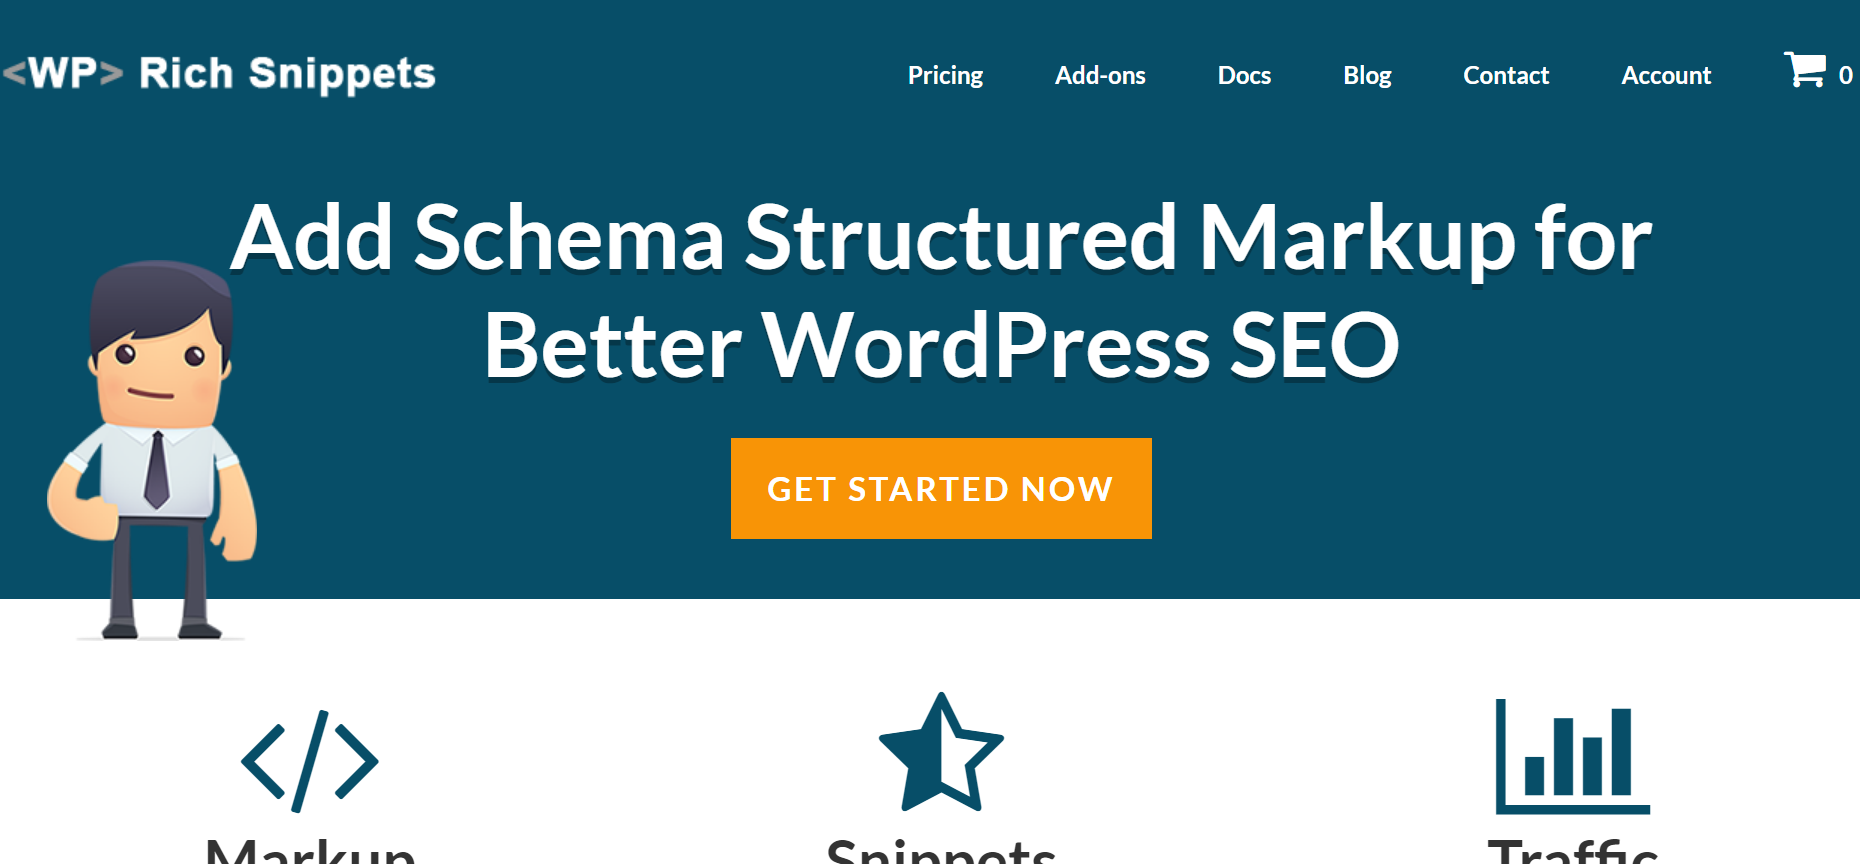 Add Schema Structured Markup for Better WordPress SEO